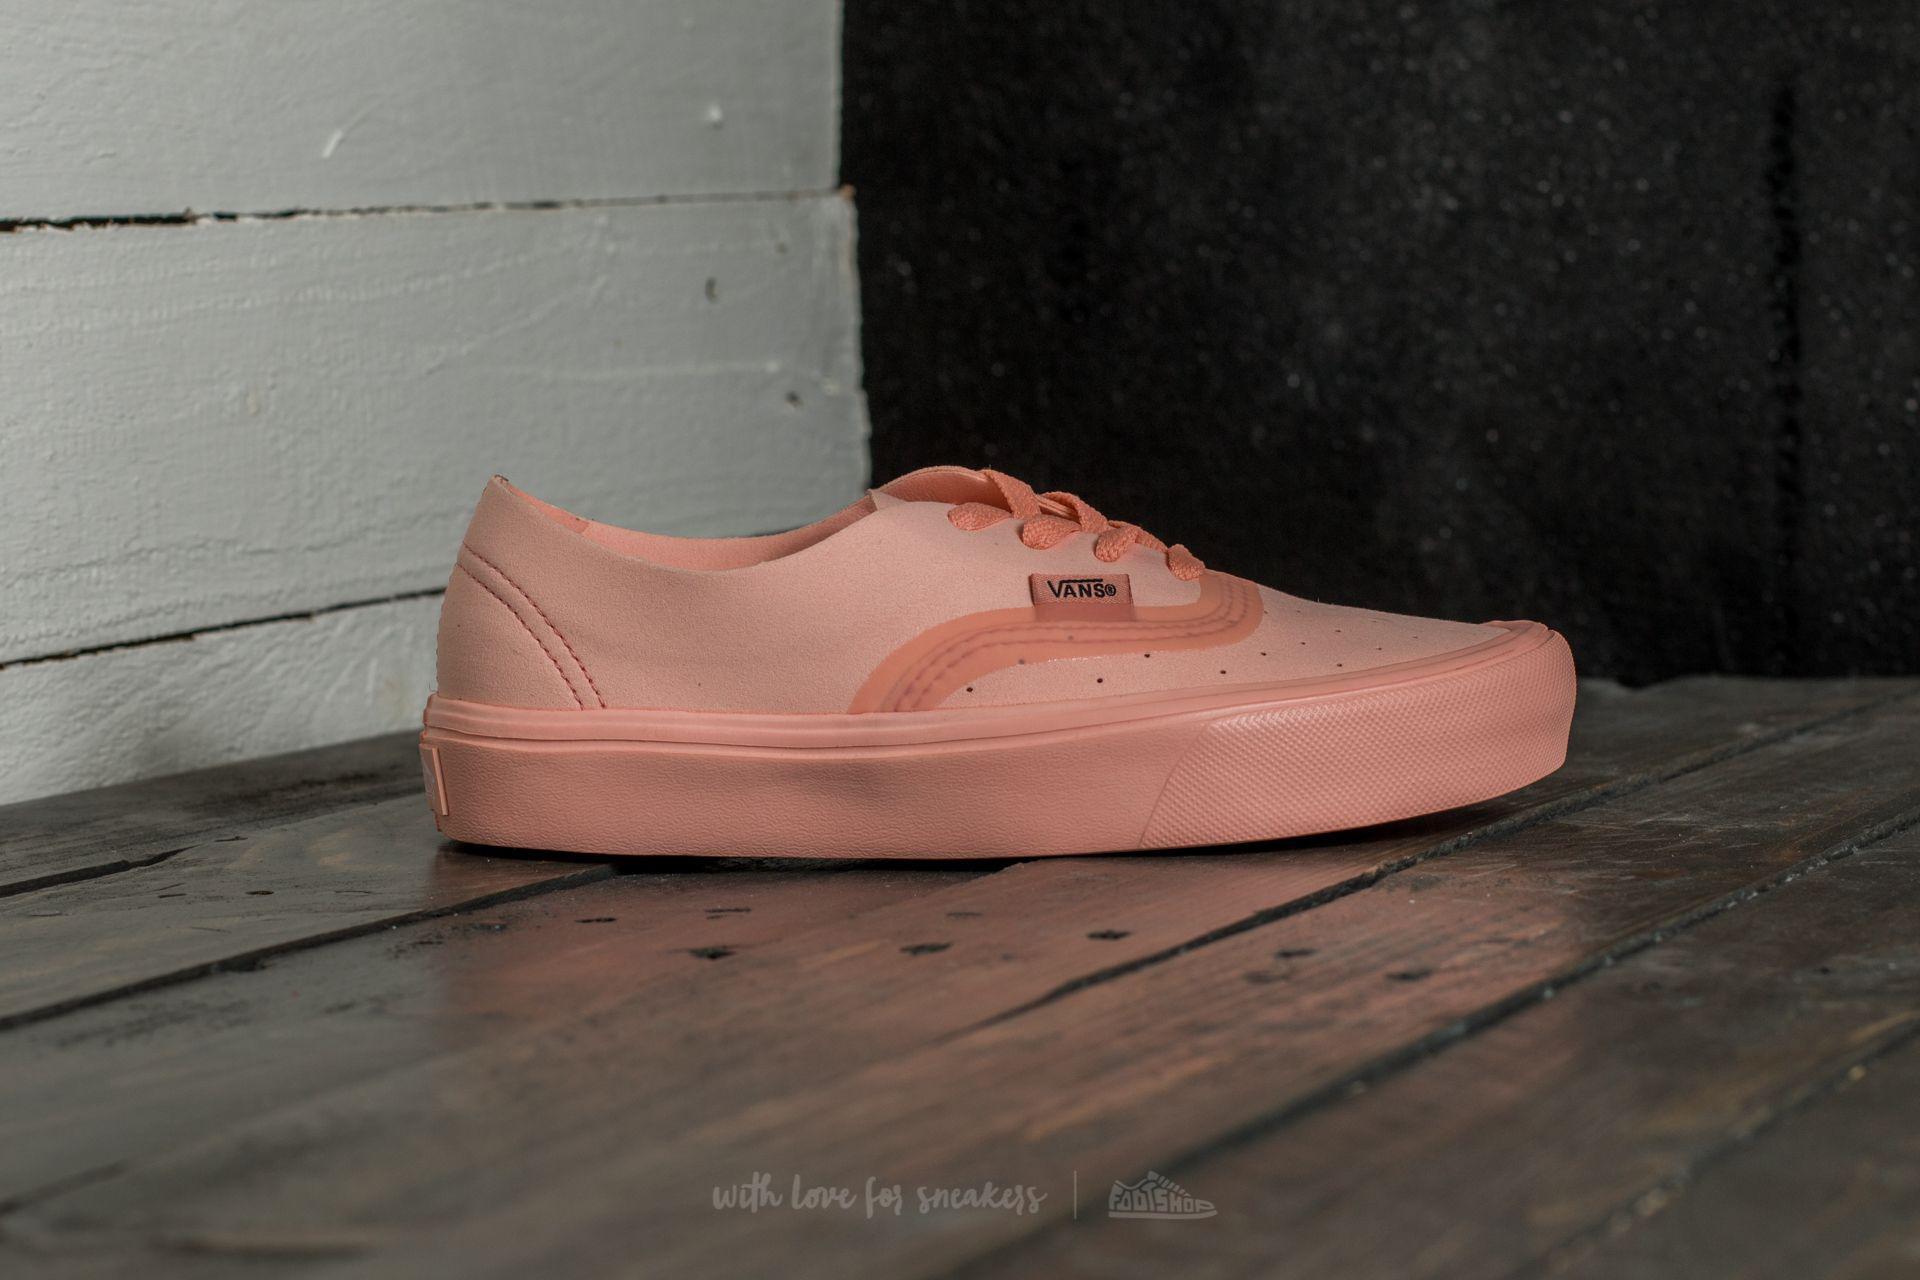 f6857a33eb2 Lyst - Vans Authentic Lite Ra (perf) Tropical Peach